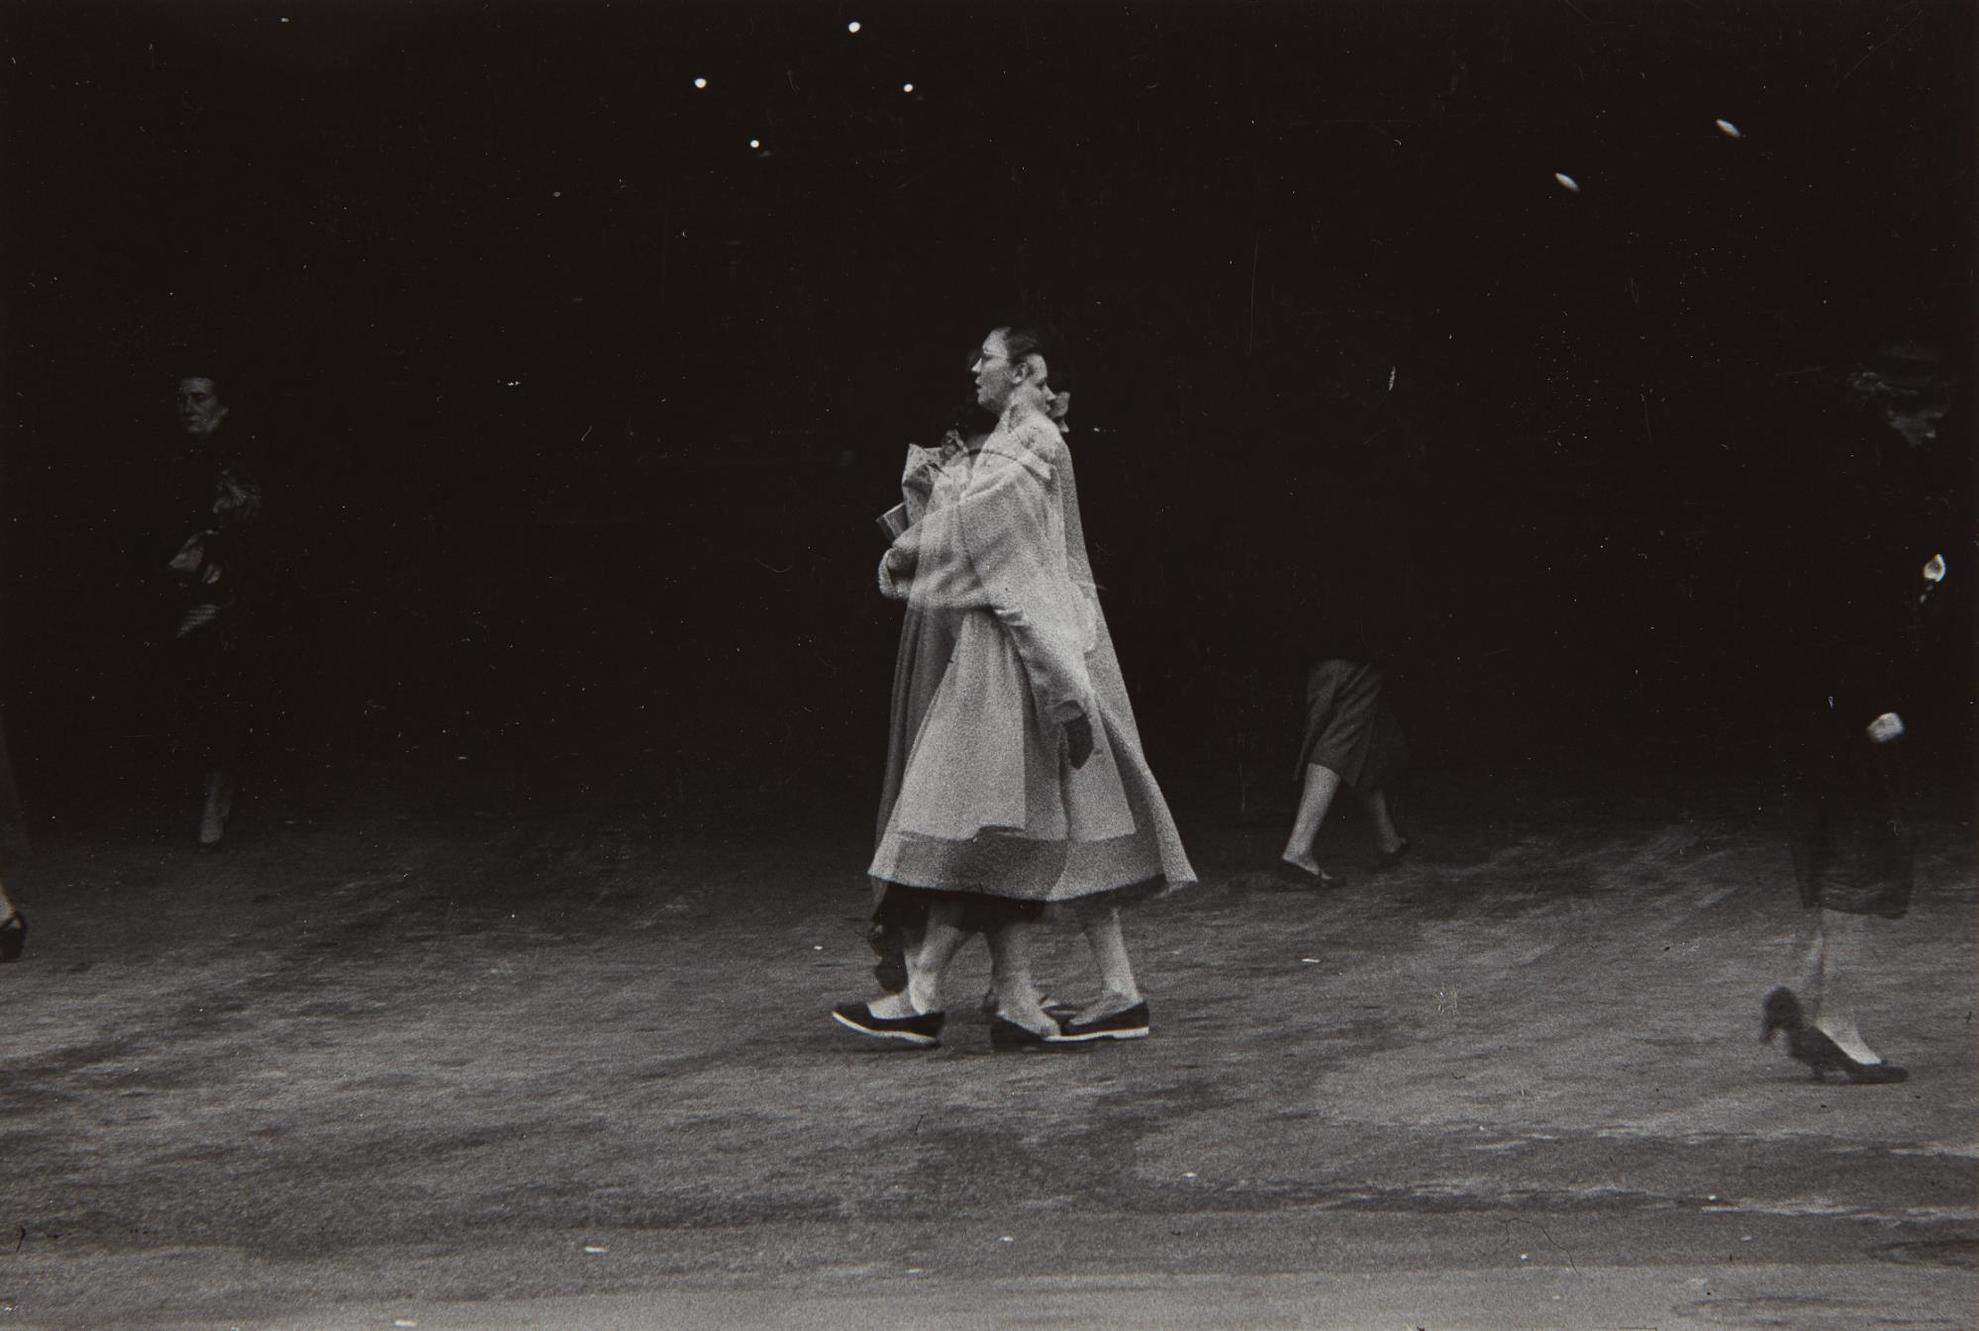 Harry Callahan-Chicago (Multiple Exposure Of Women Walking)-1955